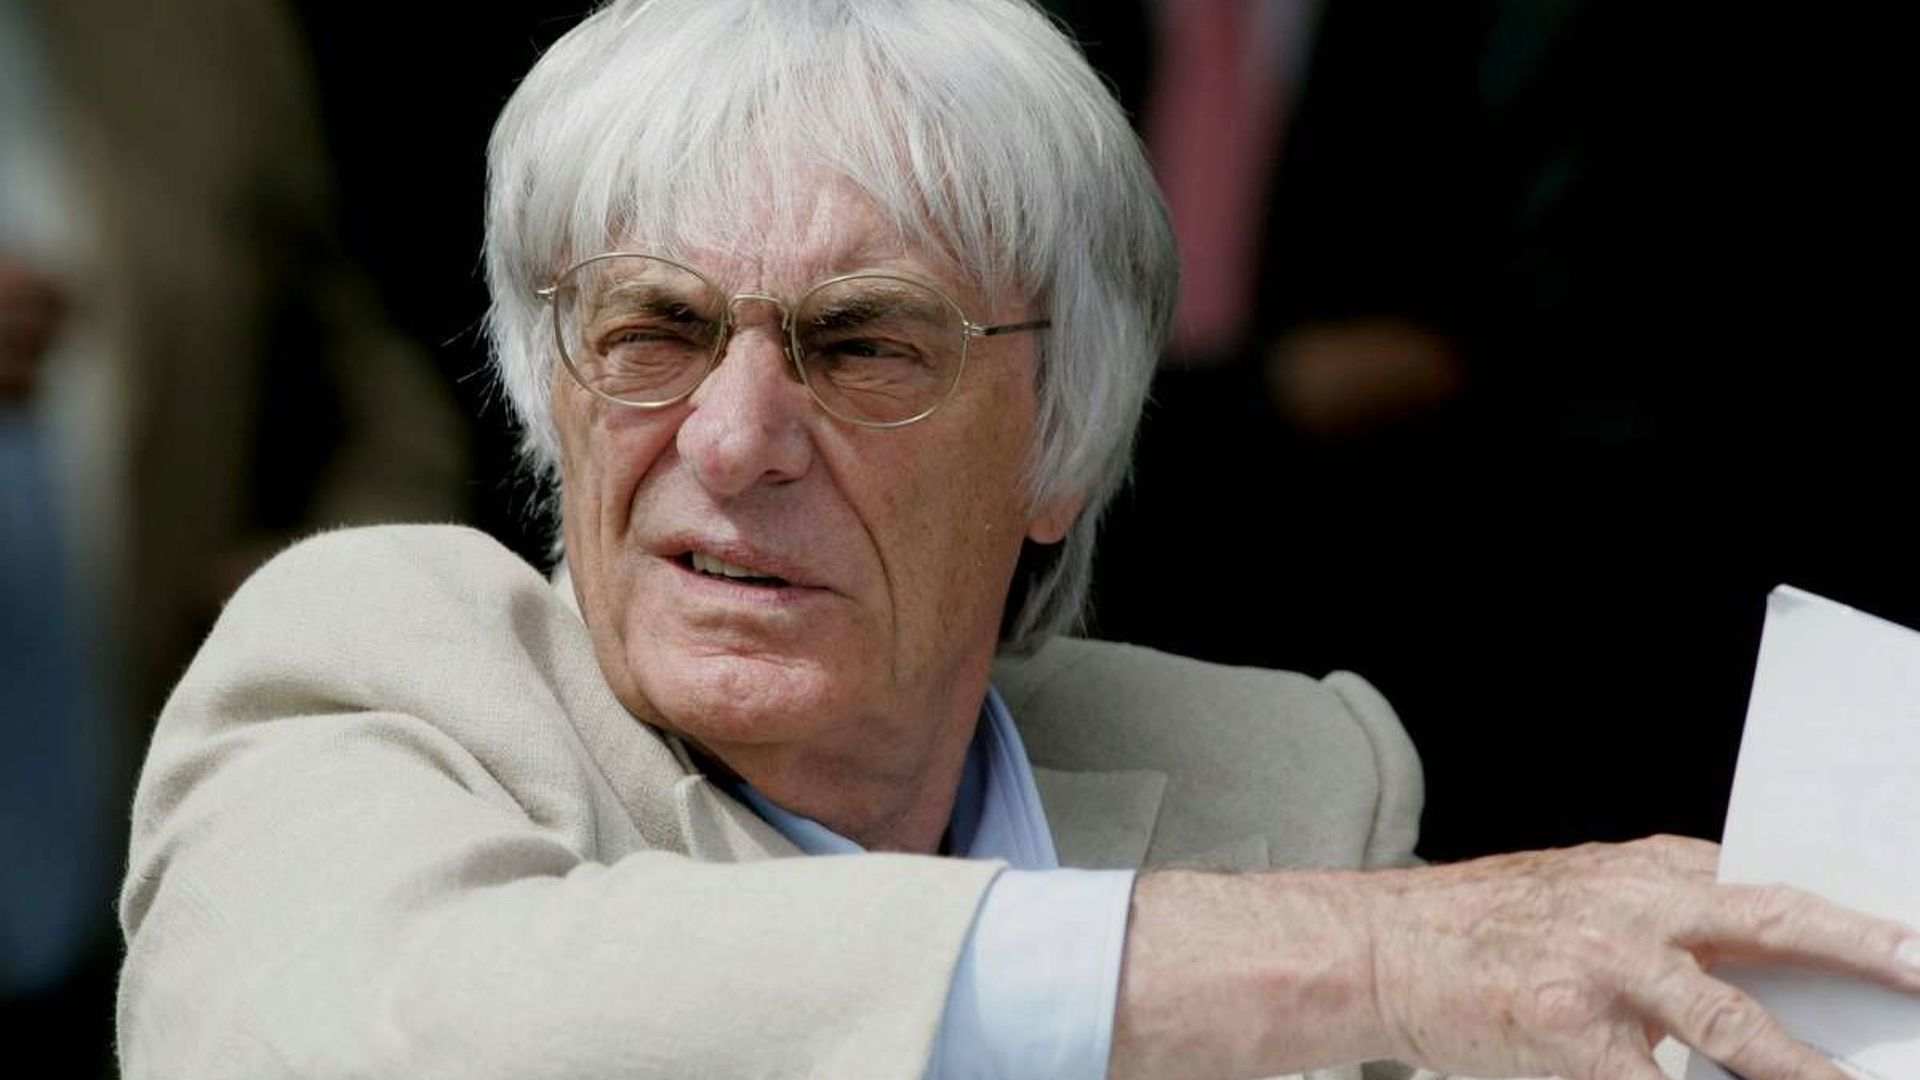 Ecclestone blames USF1 for Stefan's entry failure